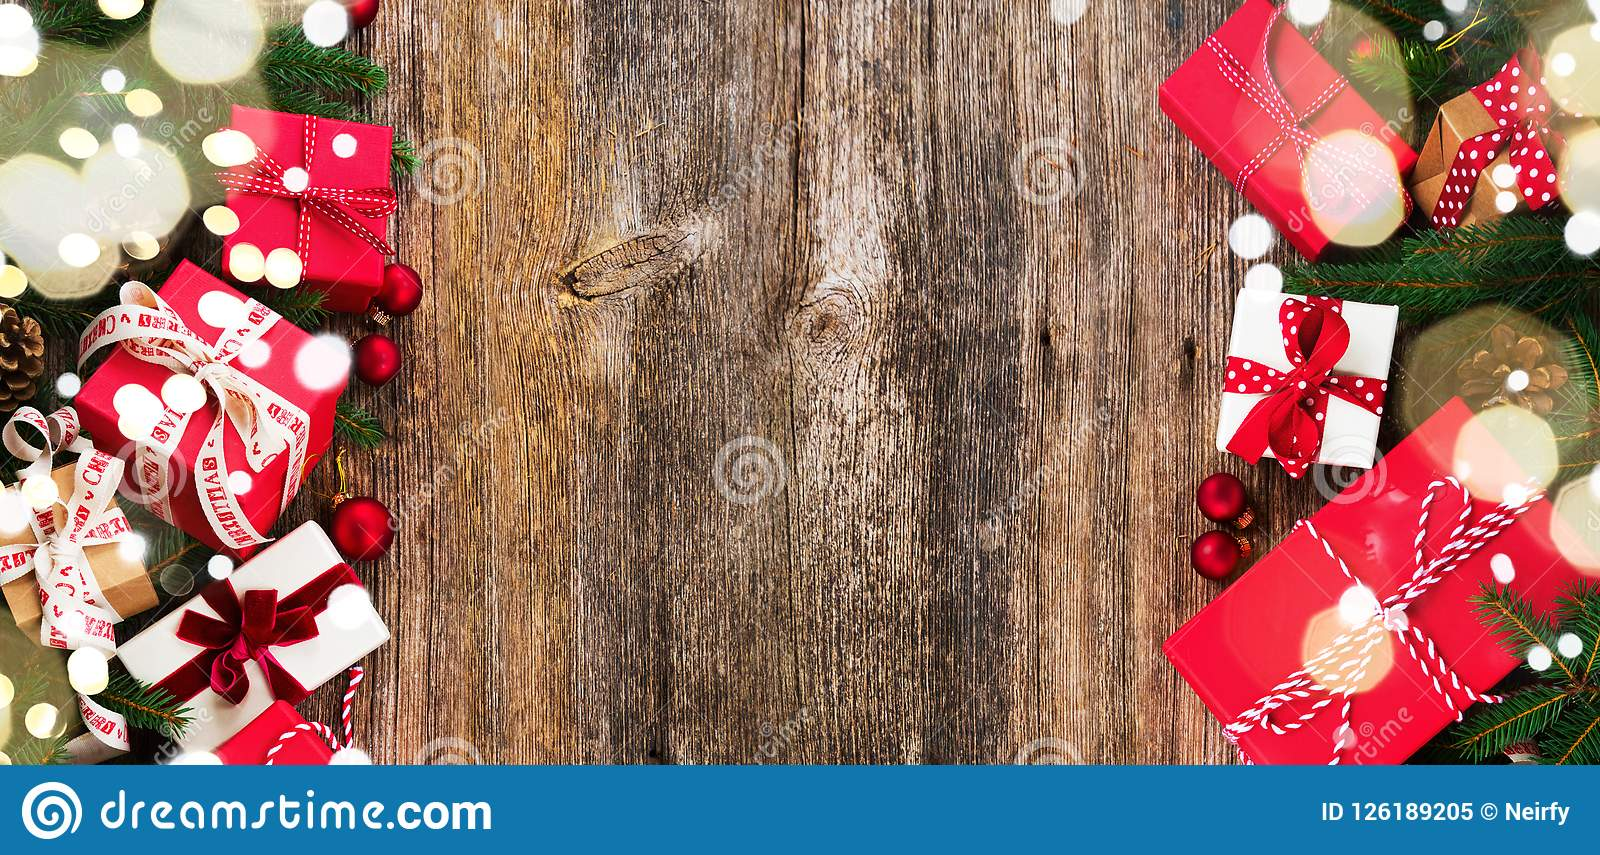 Christmas Gift Giving Images.Christmas Gift Giving Stock Image Image Of Festive 126189205